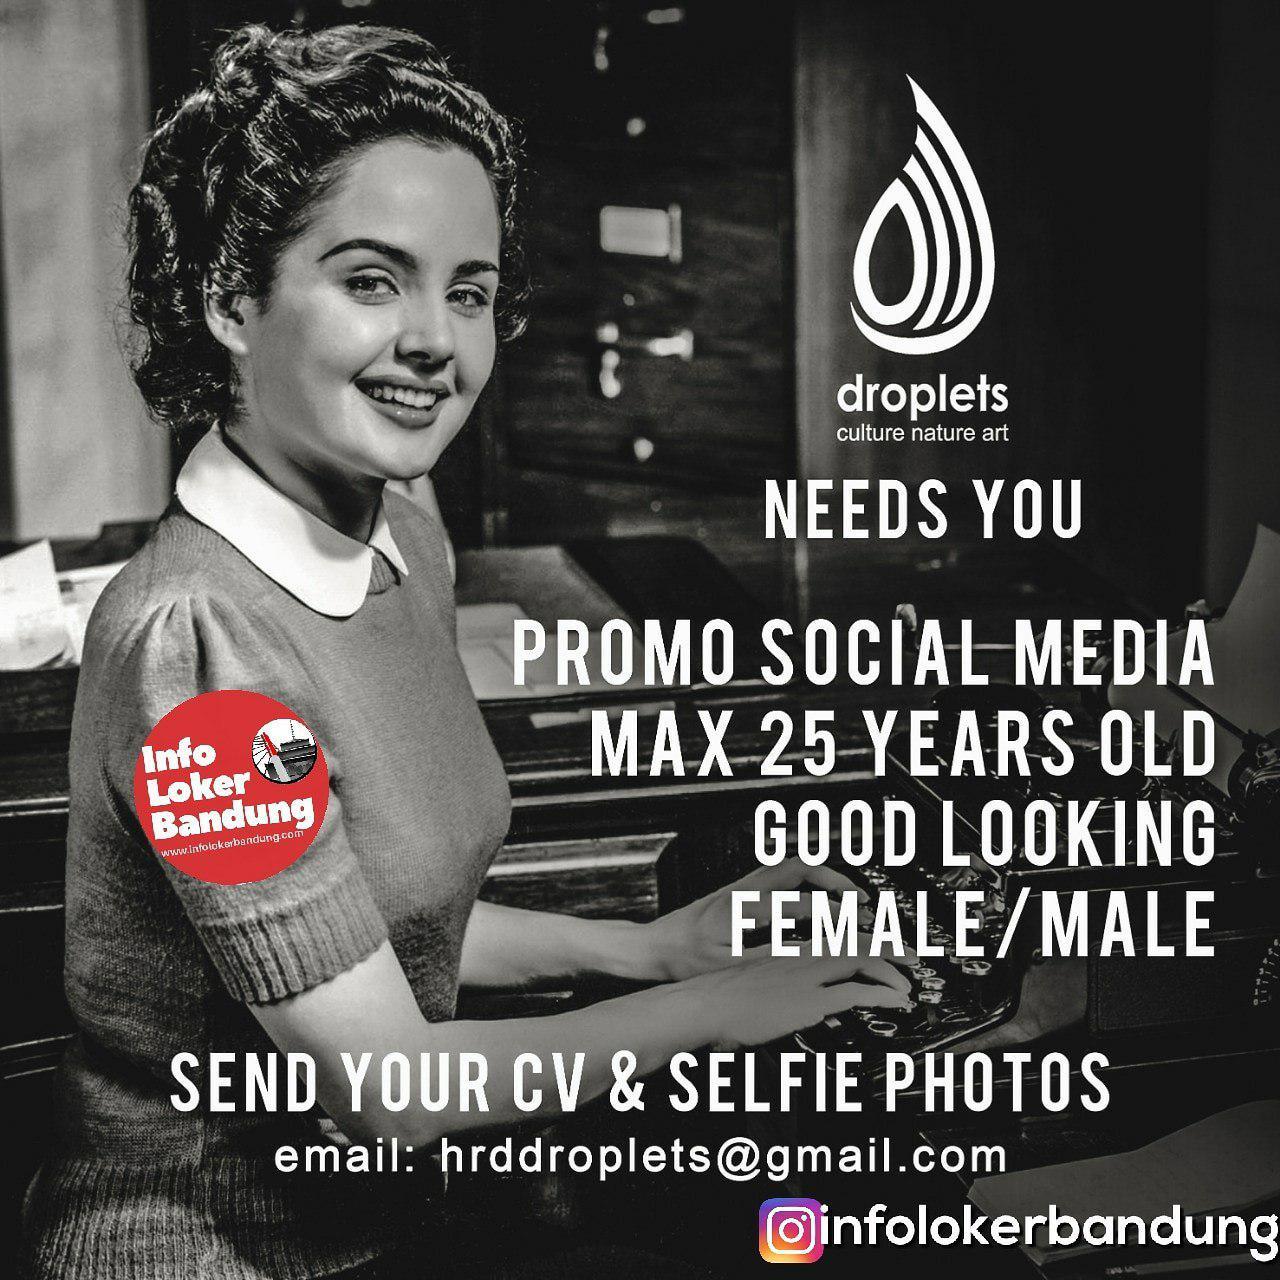 Lowongan Kerja Sebagai Promotion Social Media Droplets Bandung